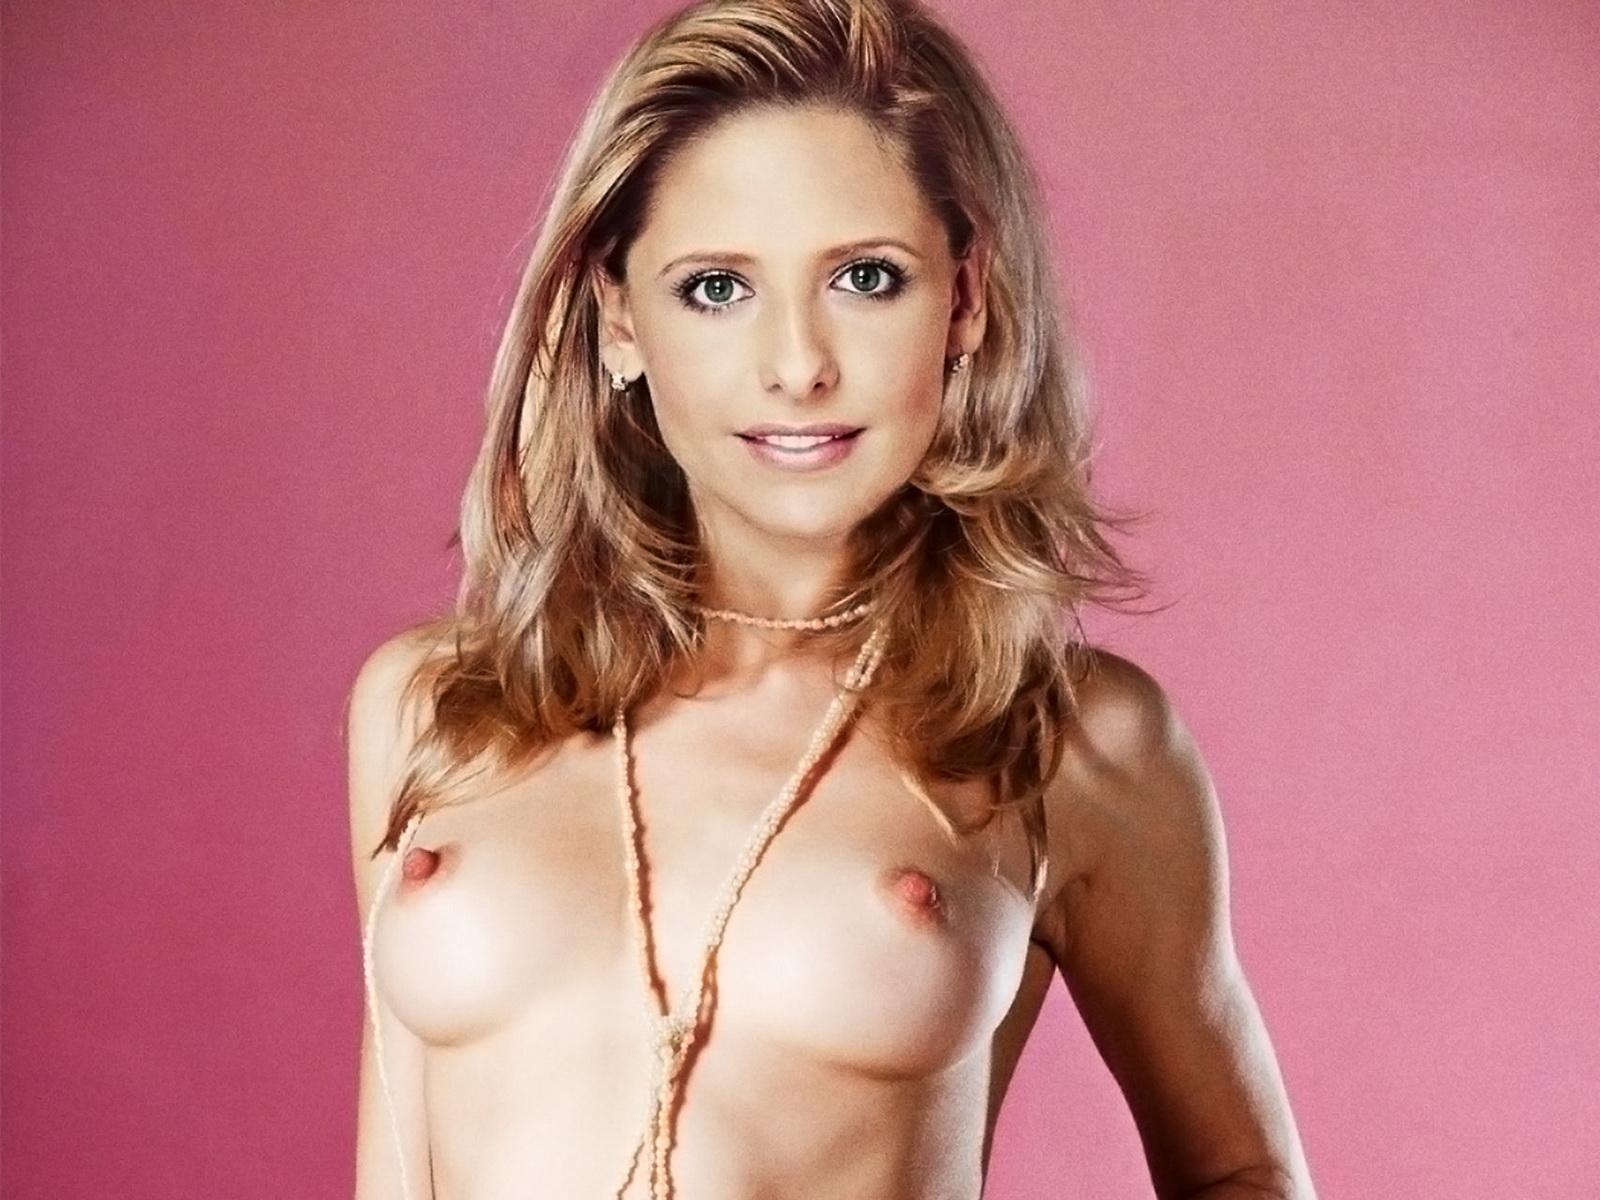 Sarah Michelle Gellar full frontal naked